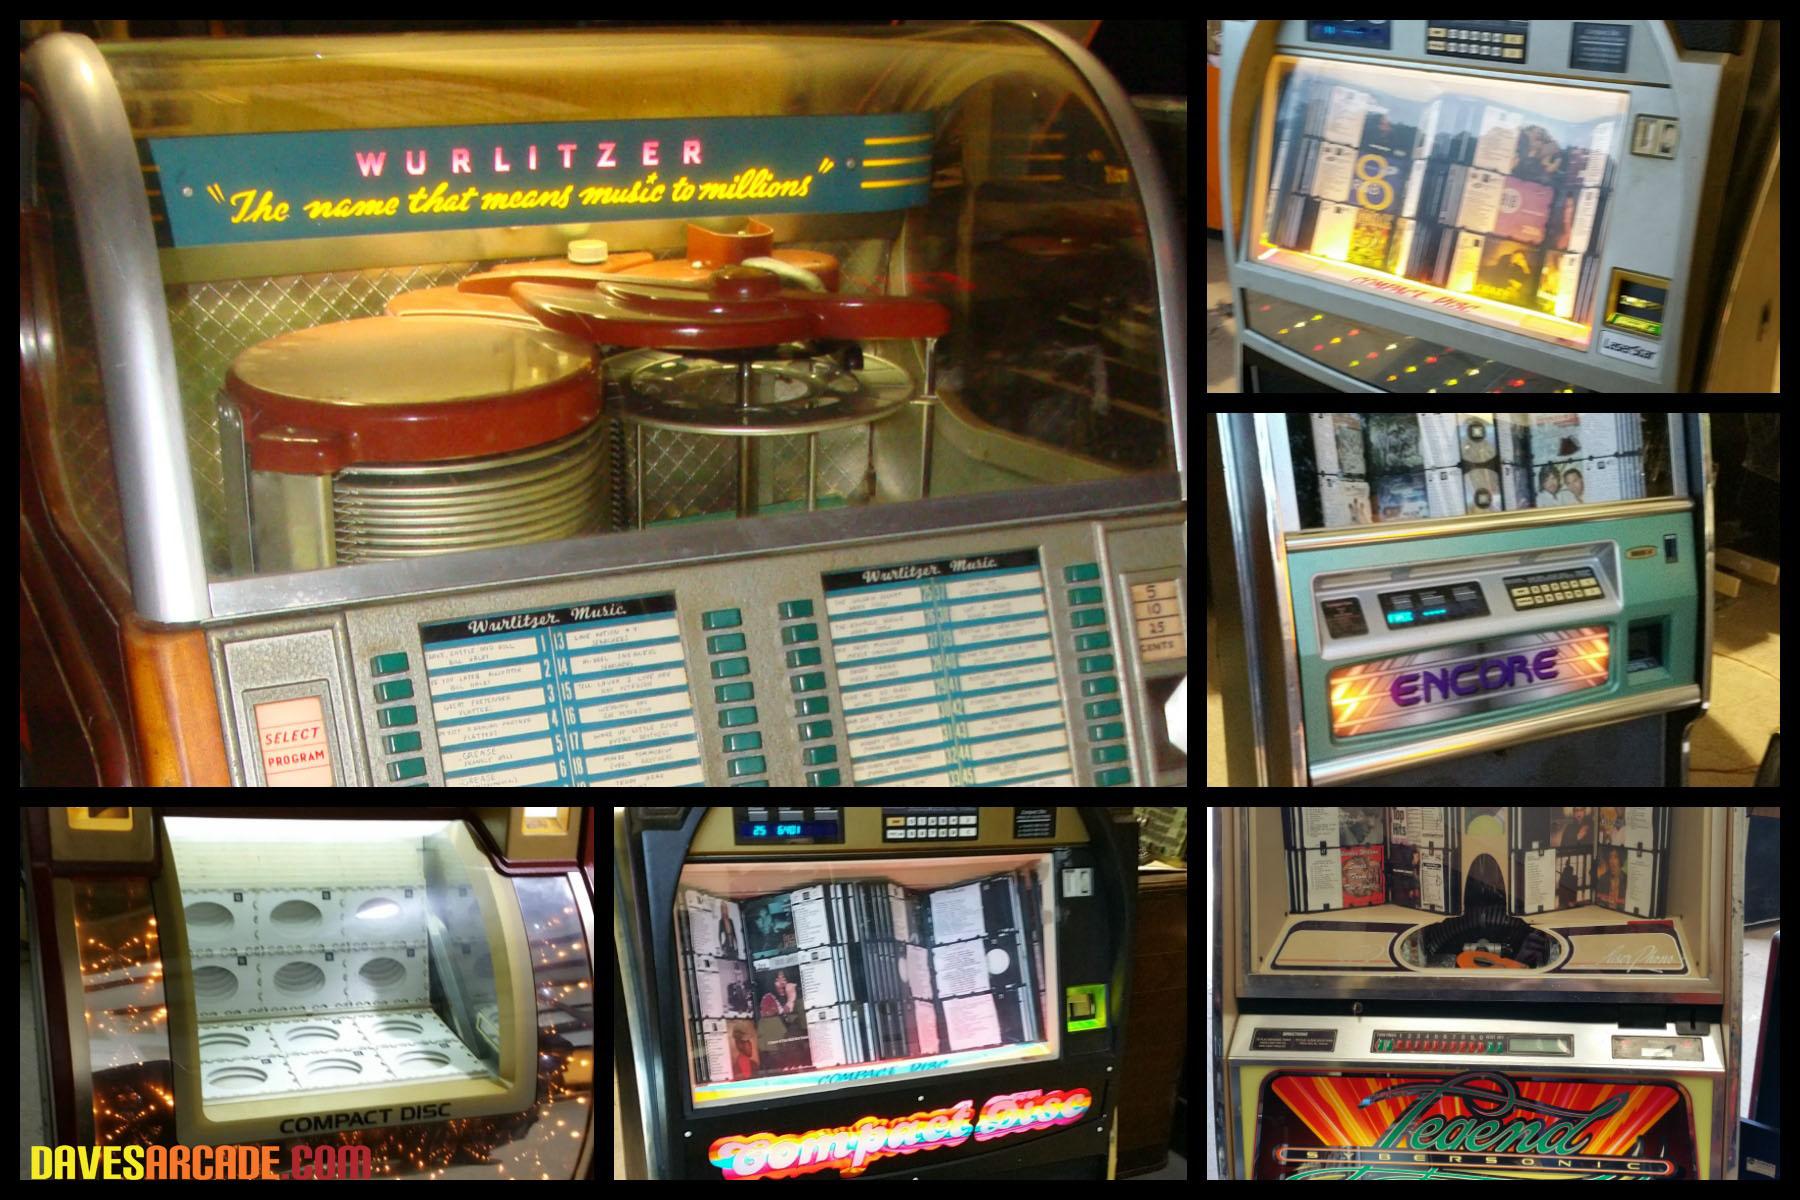 jukebox machines parts cd100 rockola rowe seeburg r-94 r-93 r-92 r-91 r-90 r-89 r-88 r-87 r-86